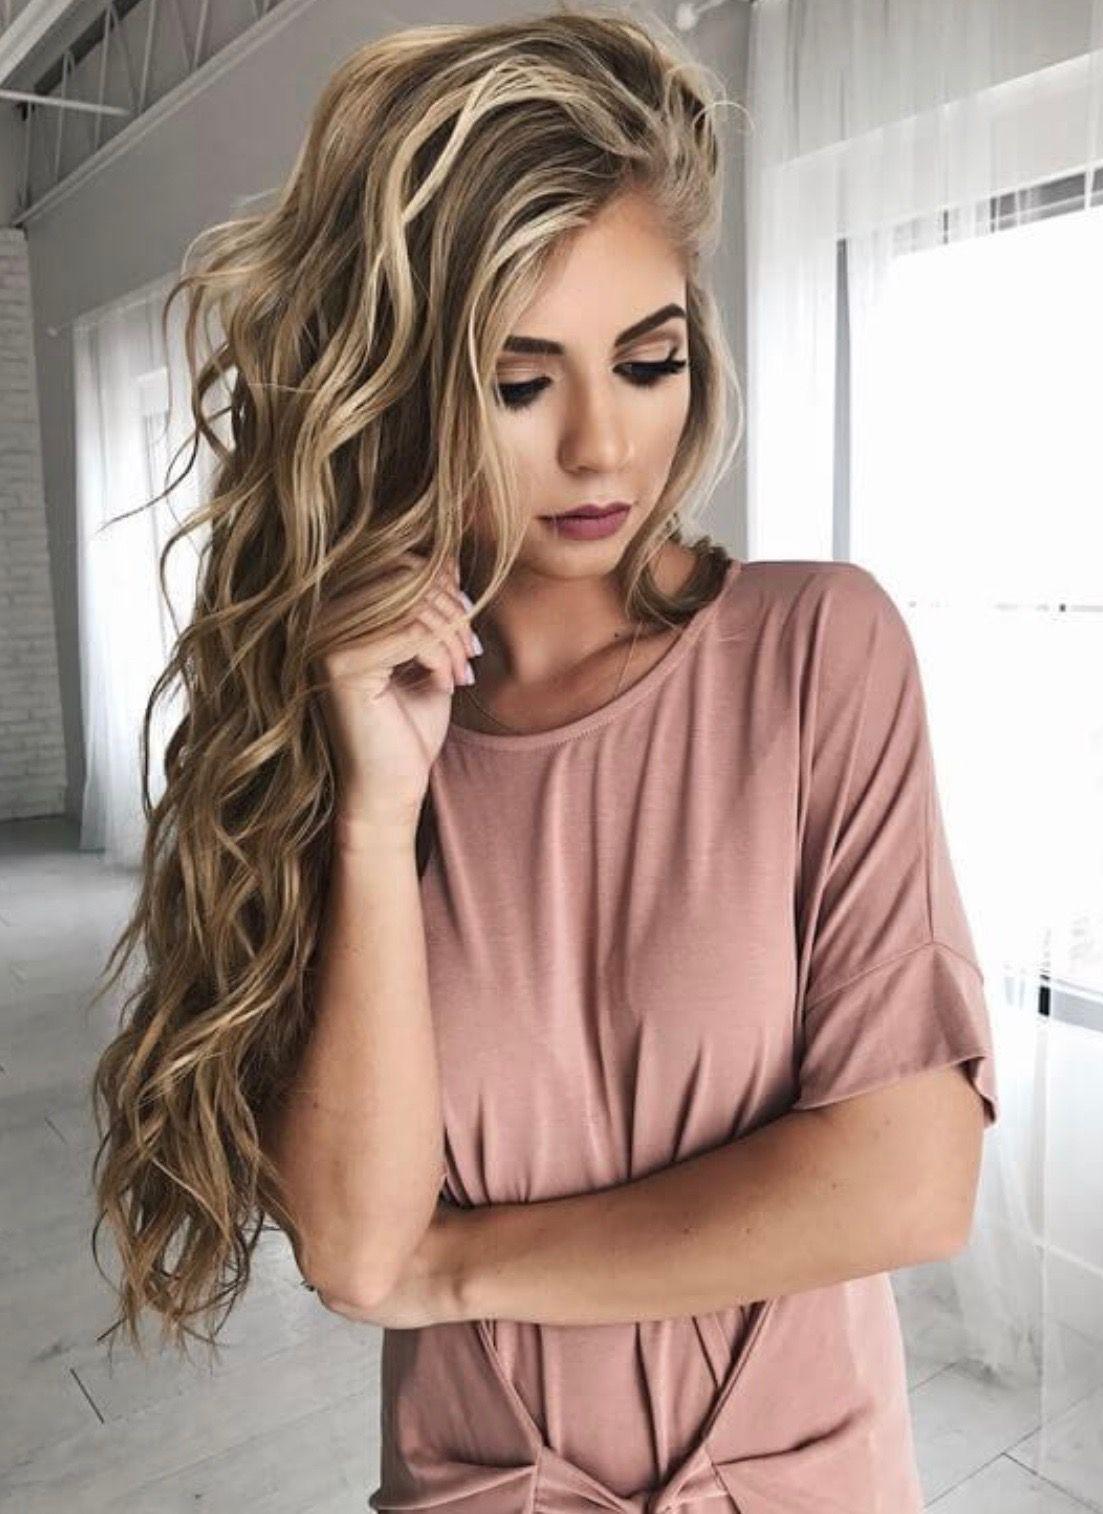 Pin by jolie on makeup tips u ideas pinterest hair extensions